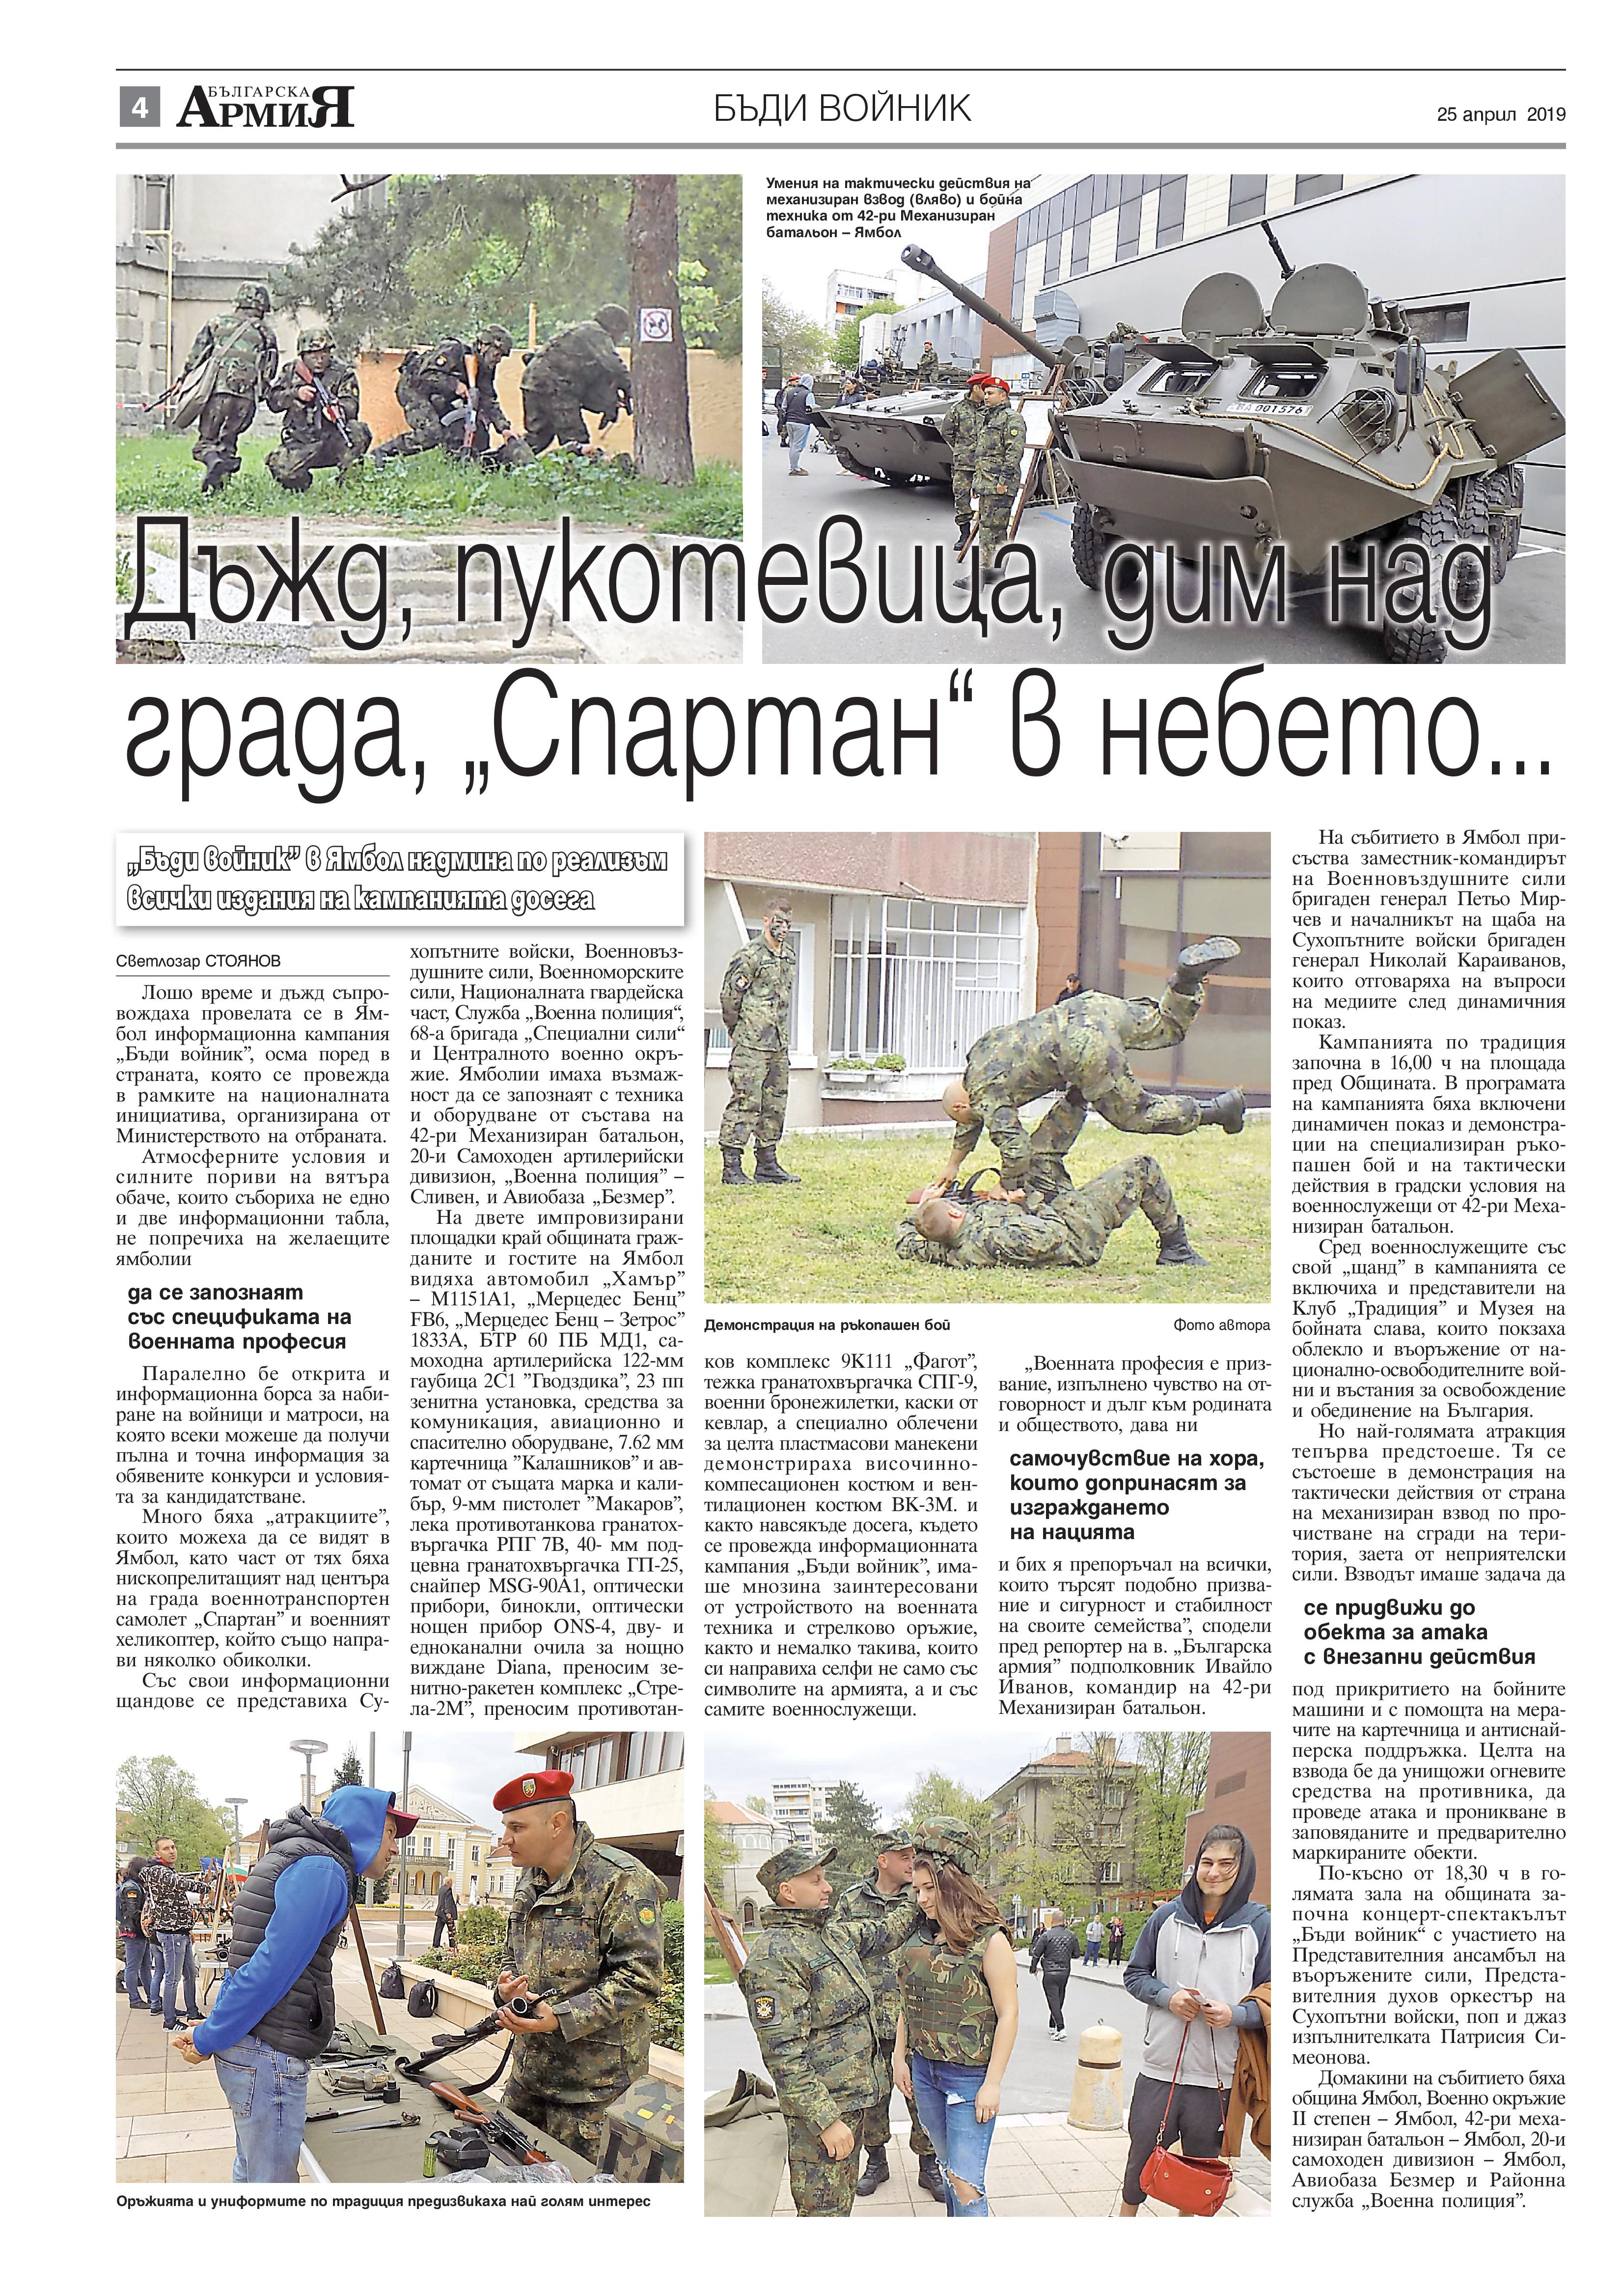 https://www.armymedia.bg/wp-content/uploads/2015/06/04-27.jpg